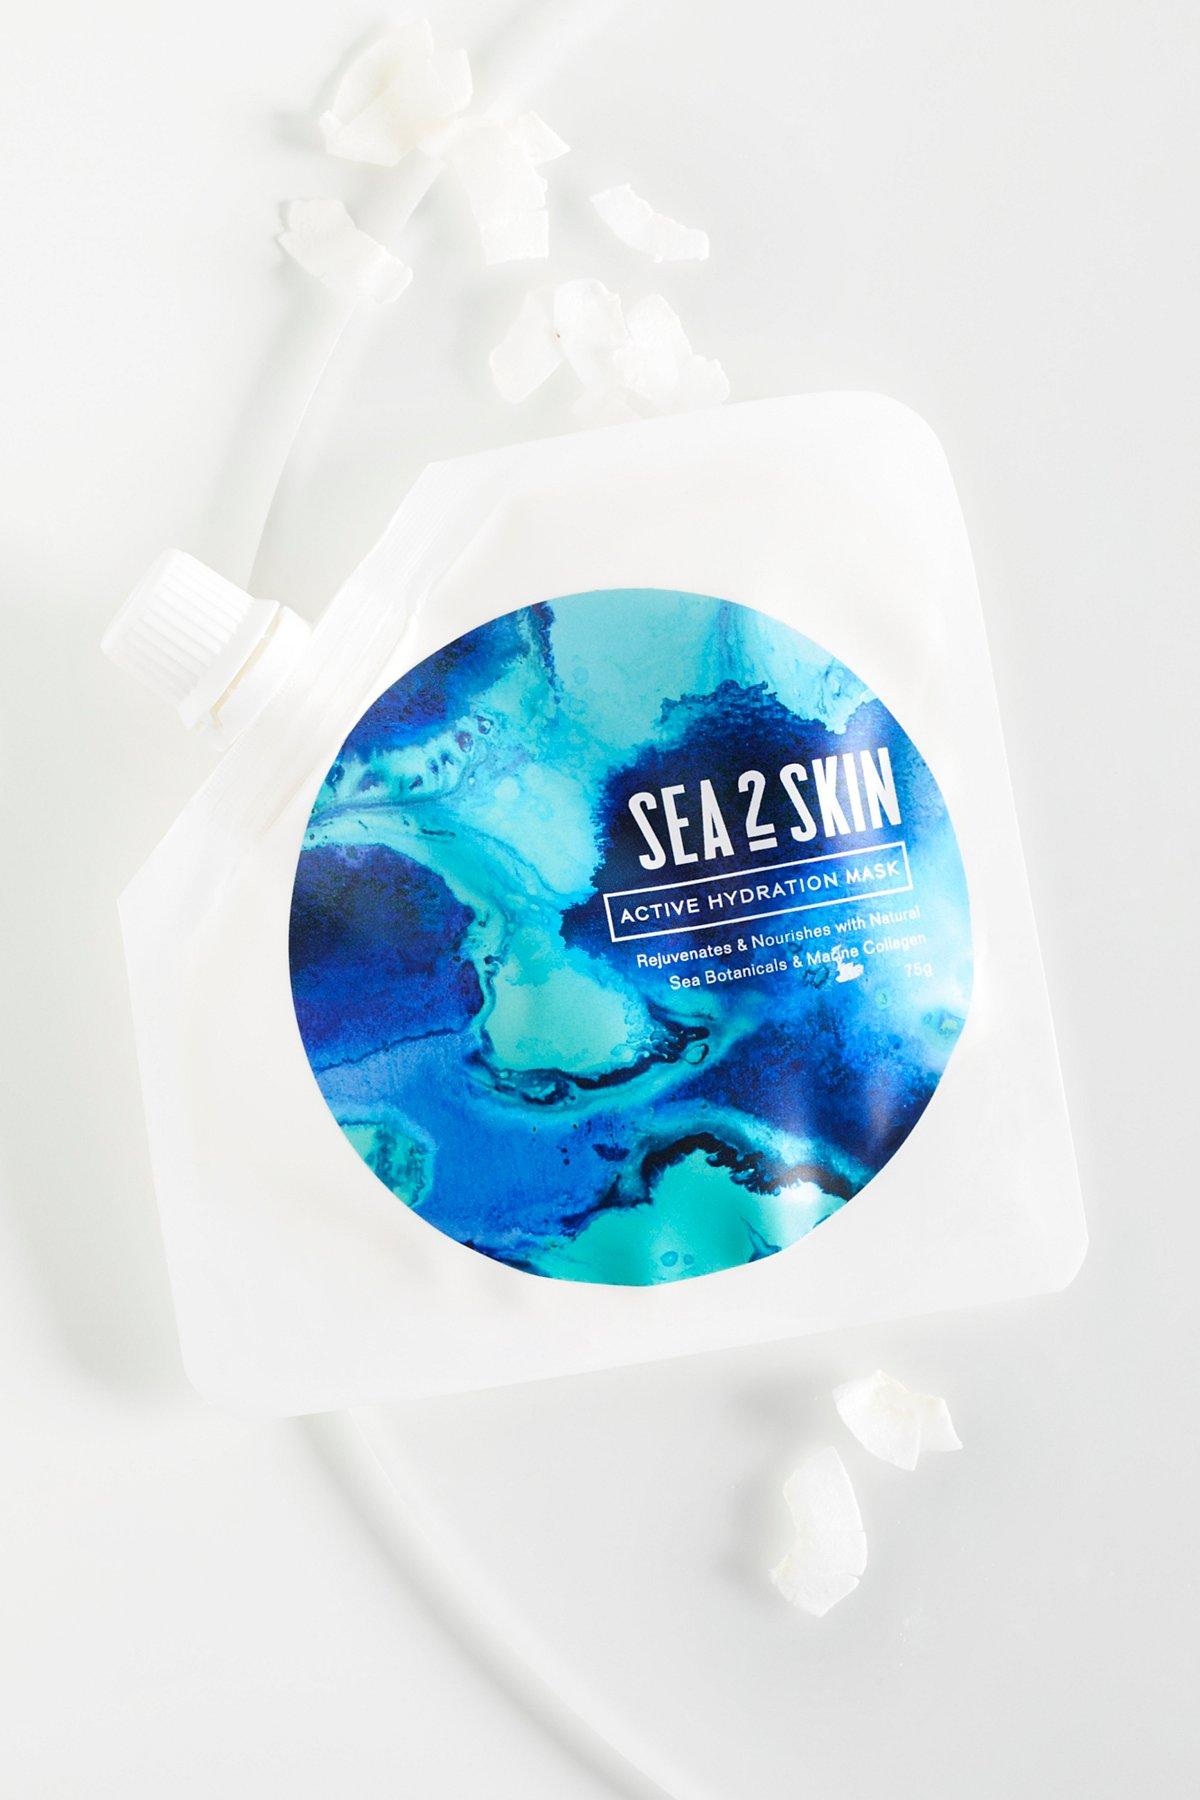 Sea2skin Active Hydration Mask